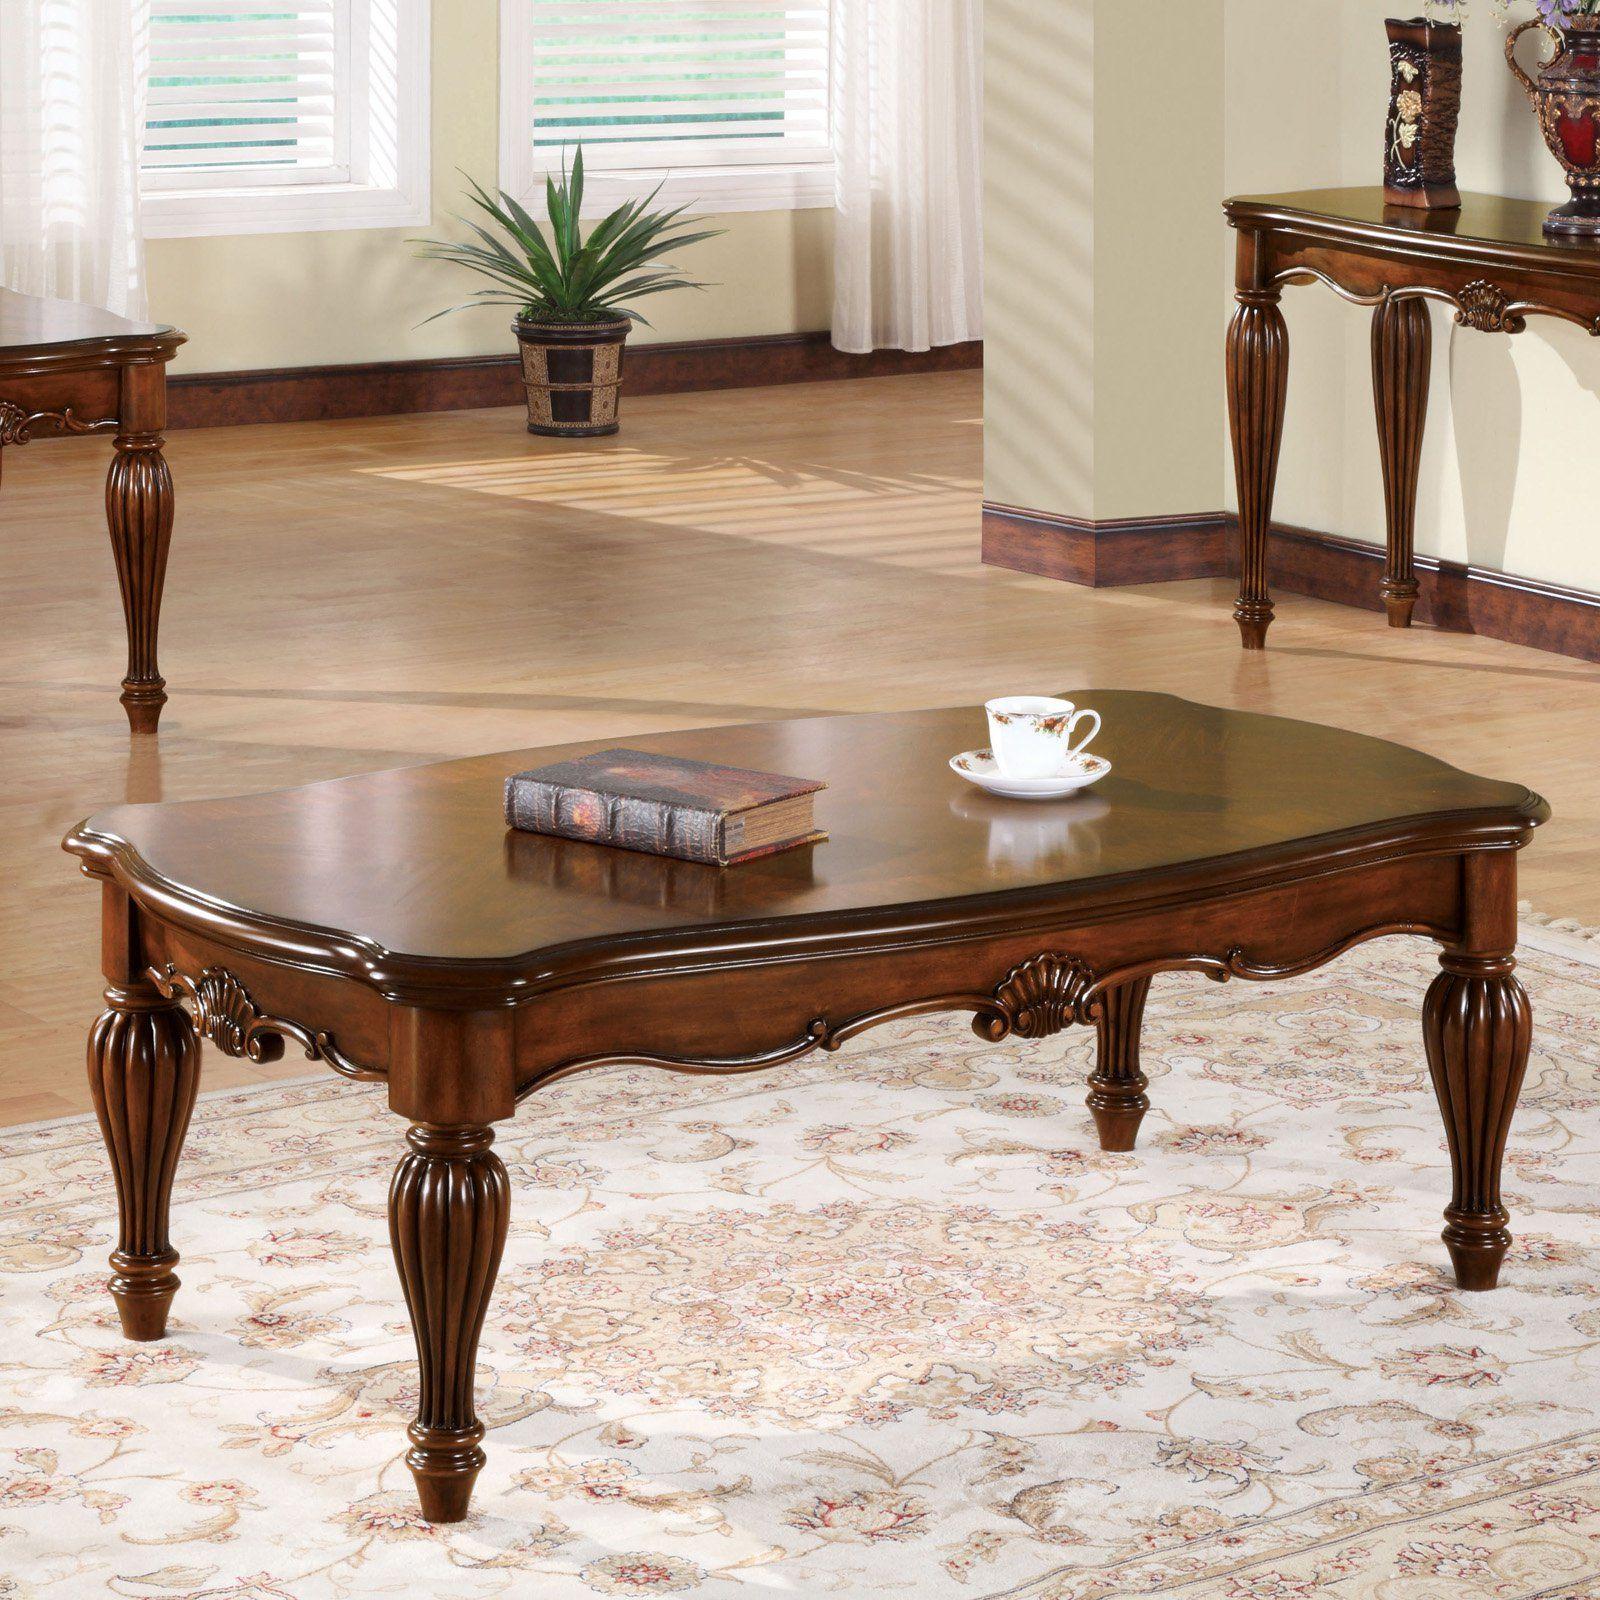 Acme Furniture Dreena Coffee Table Traditional Coffee Table Cherry Coffee Table Wood Table Living Room [ 1600 x 1600 Pixel ]